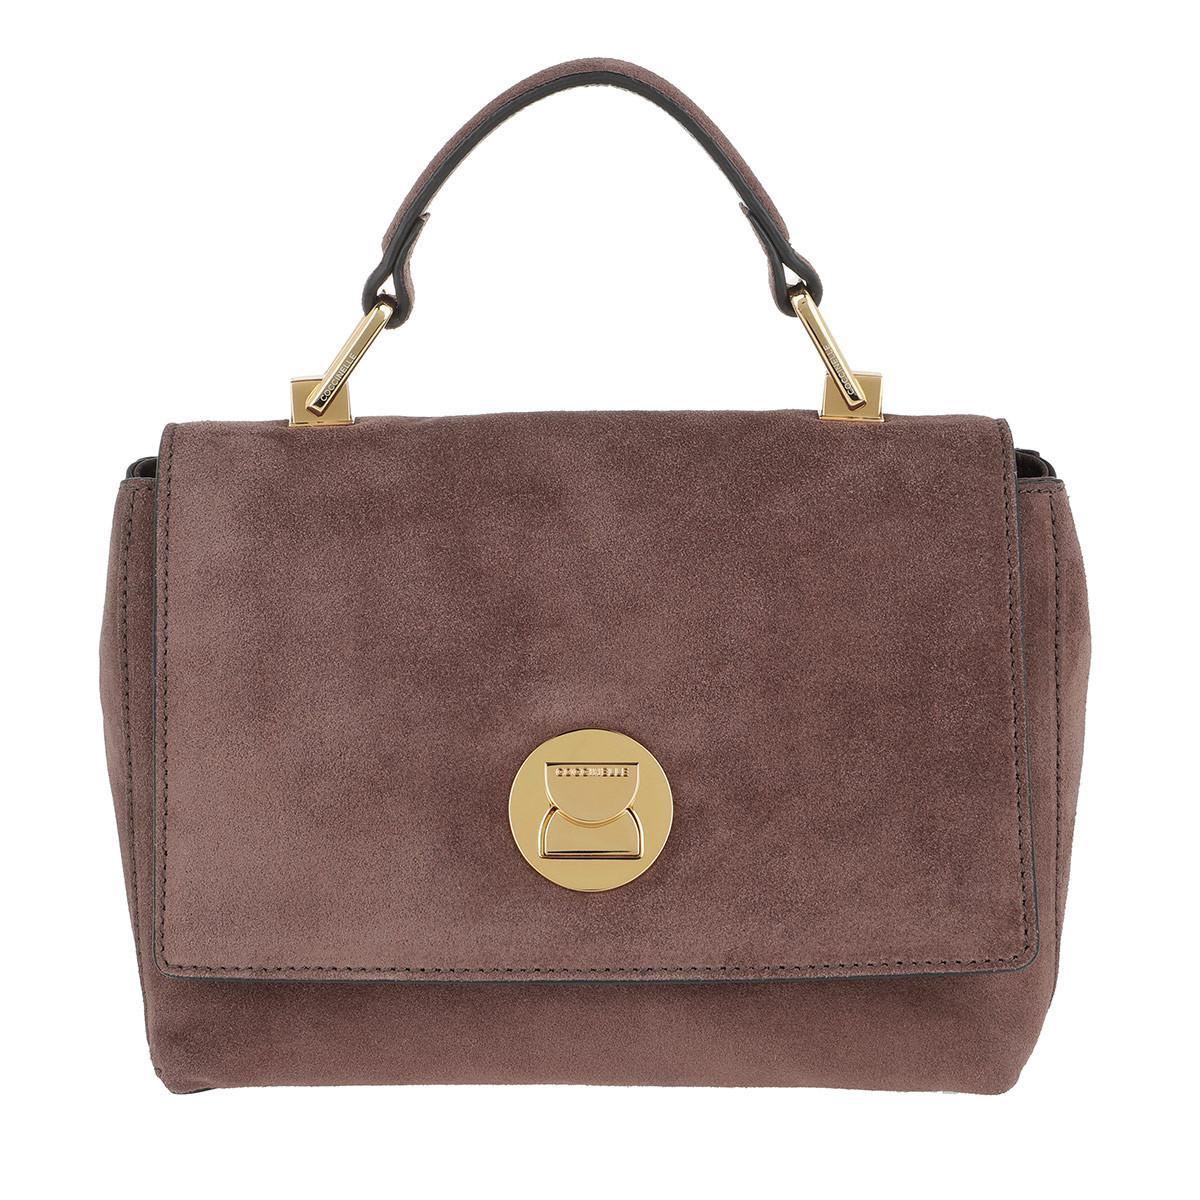 Coccinelle Satchel Bags - Liya Suede Handbag Marron Glace - - Satchel Bags for ladies Comfortable Cheap Price bfnq2YfA9X